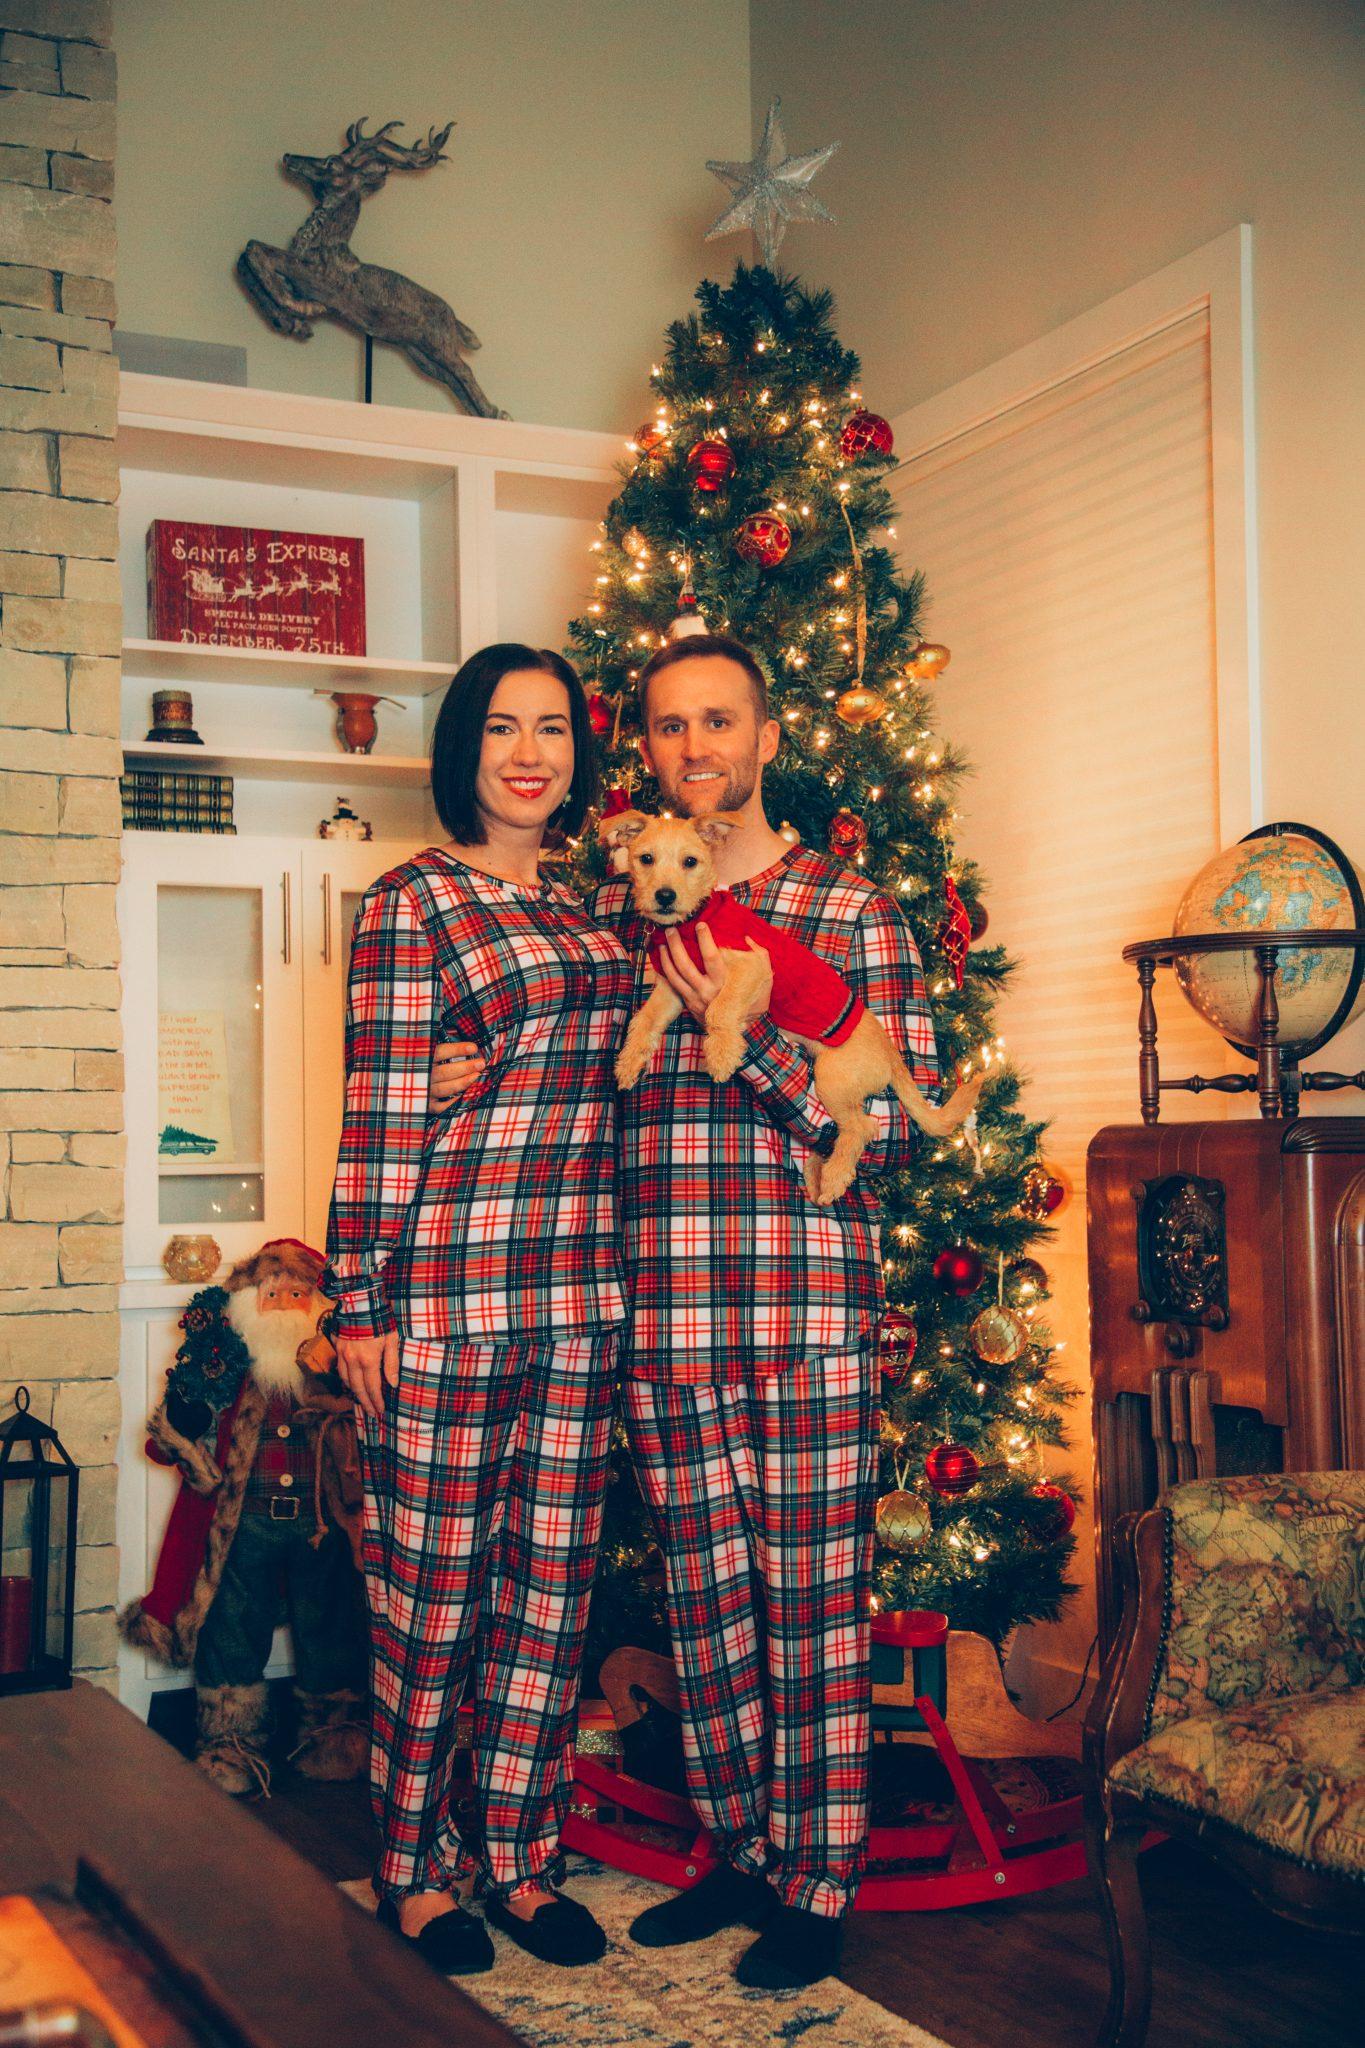 Shinesty Reviews for Matching Couples' Christmas Pajamas & Festive Dresses